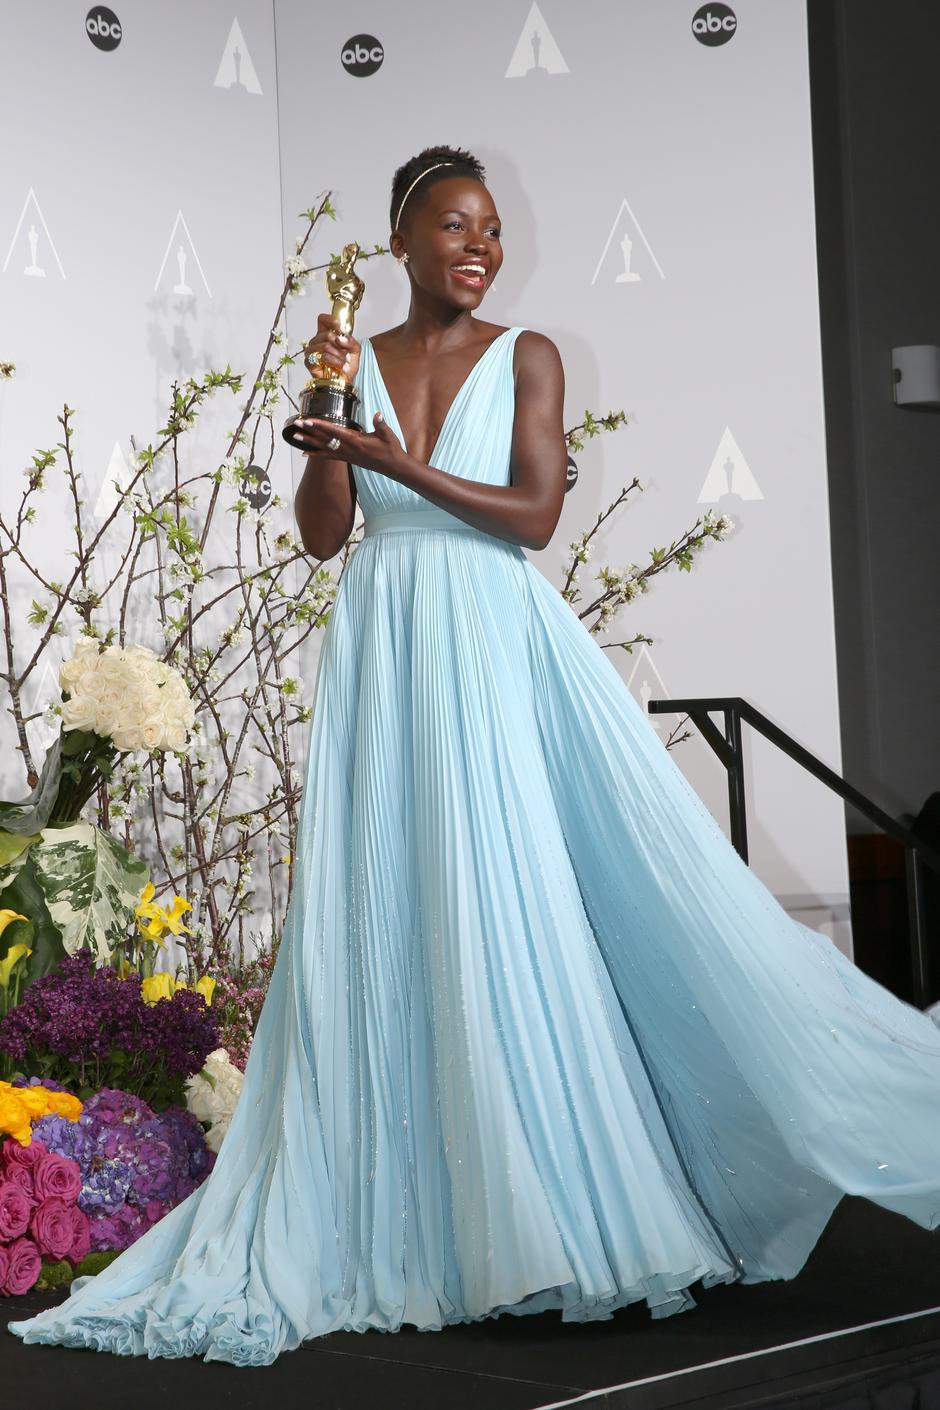 Lupita Nyong'o, dodjela Oscara | Autor: Shutterstock